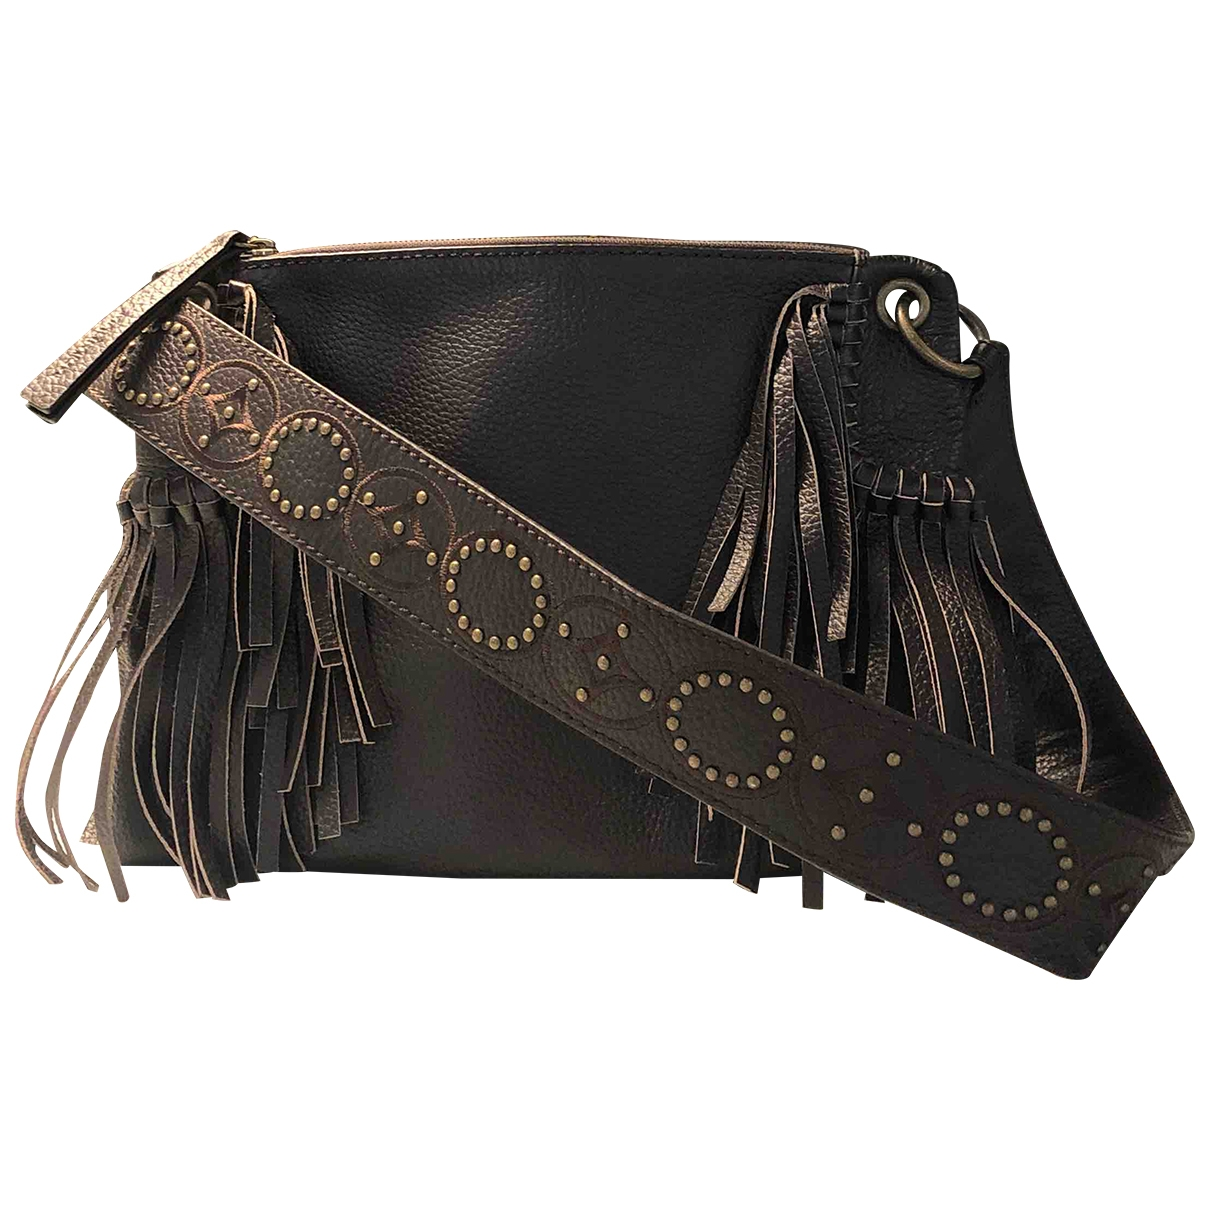 Maliparmi \N Brown Leather handbag for Women \N